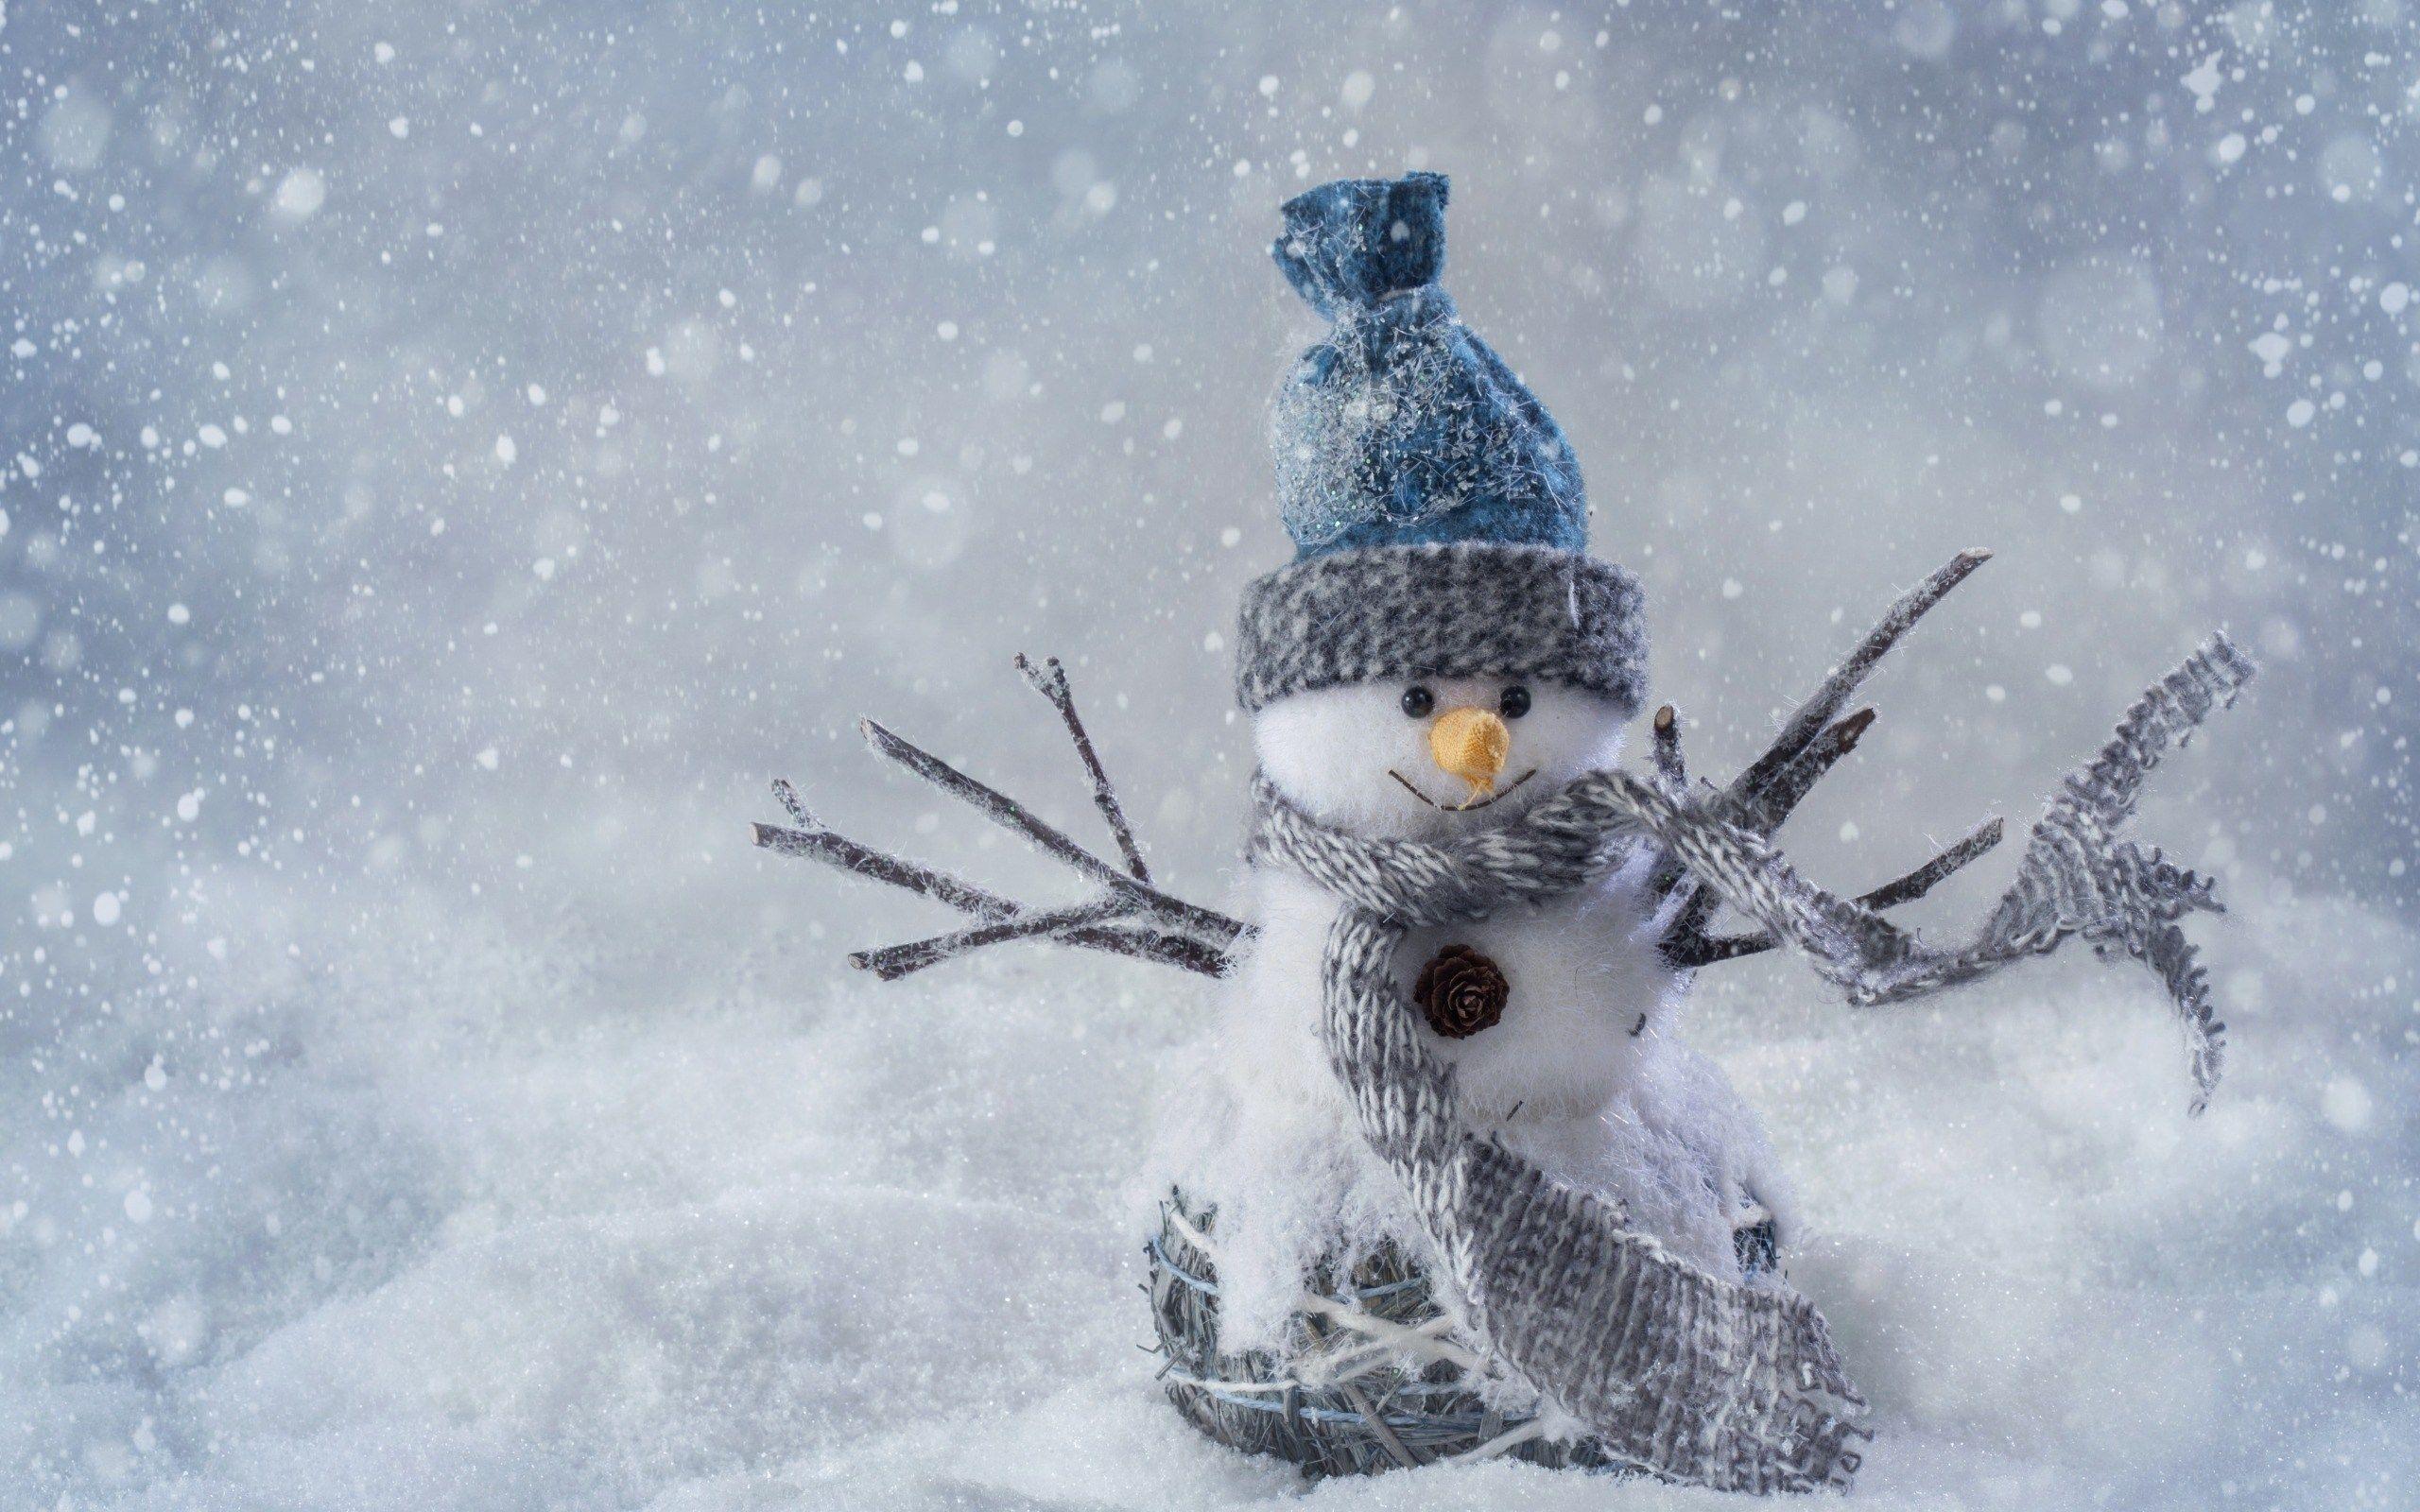 Winter Computer Backgrounds Wallpaper 2560x1600 Christmas Wallpaper Snowman Christmas Snowman